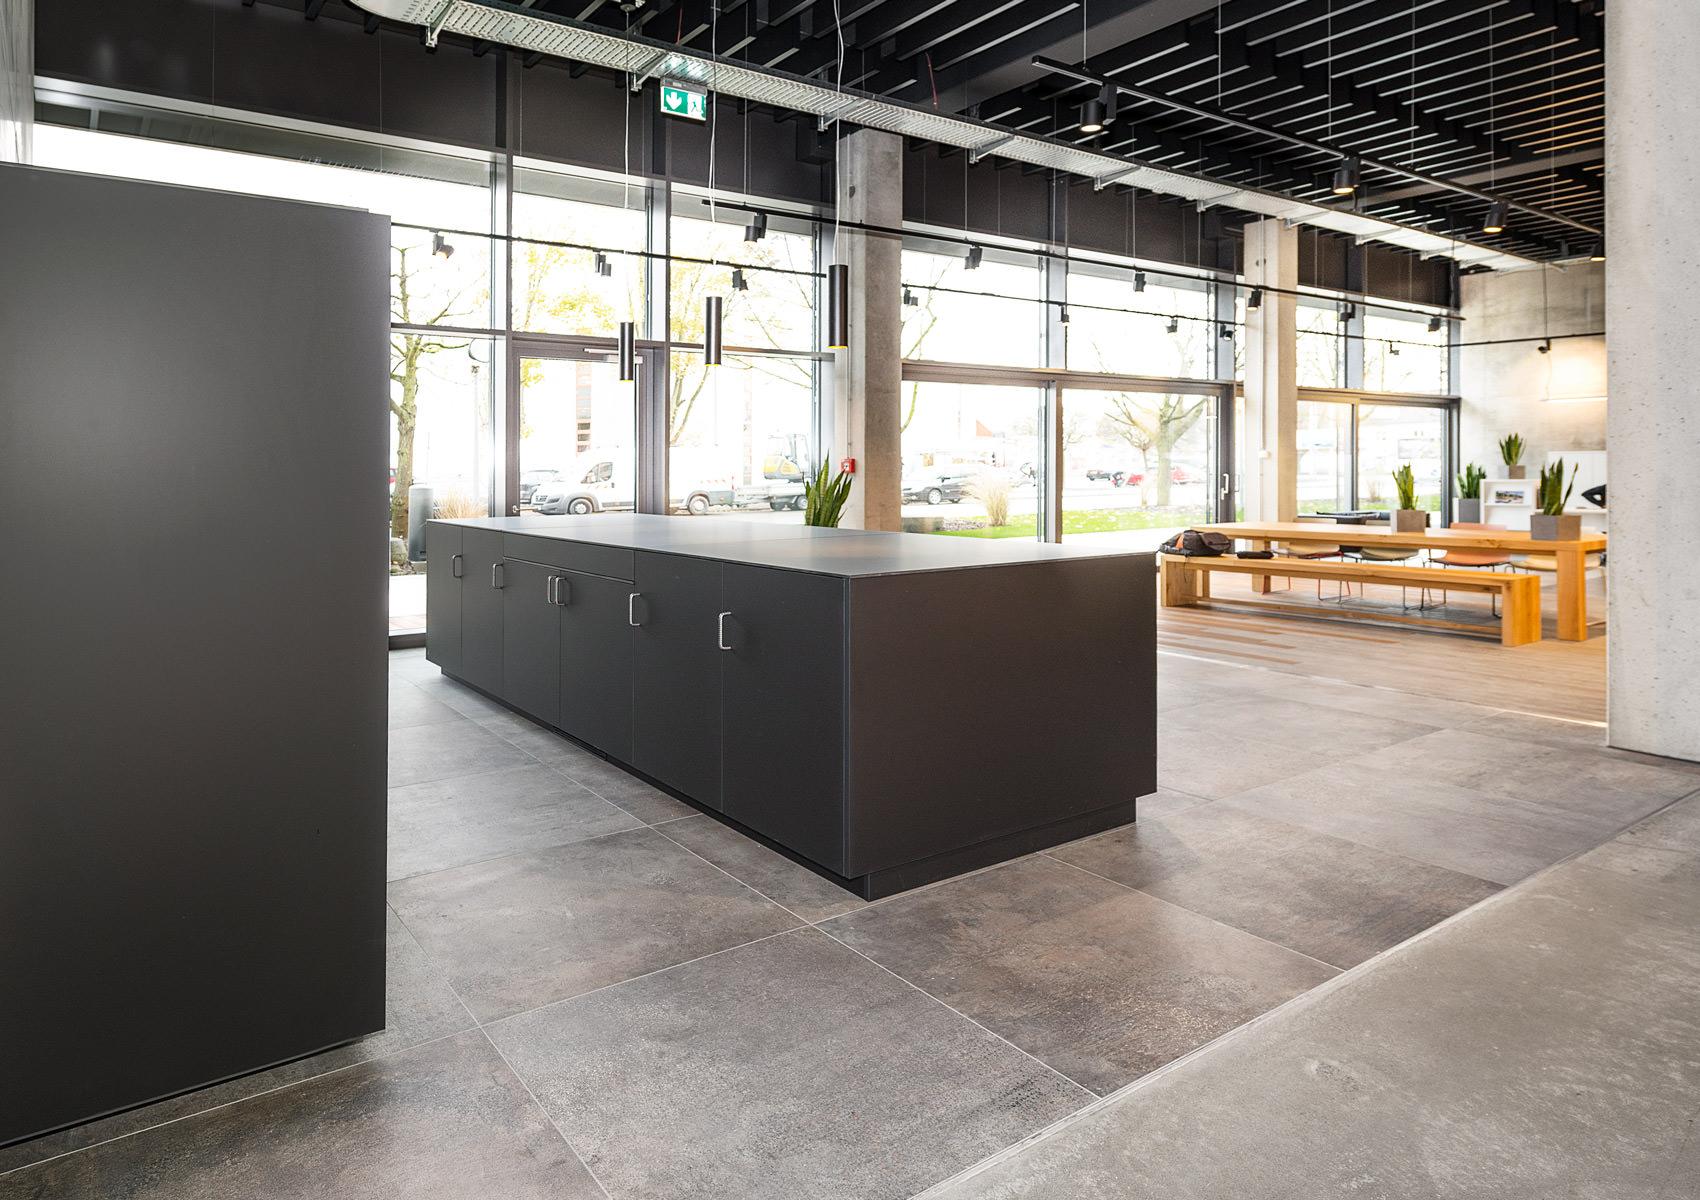 Ladenausstattung Küche/Bar – Reiner Knabl – Möbelwerkstatt